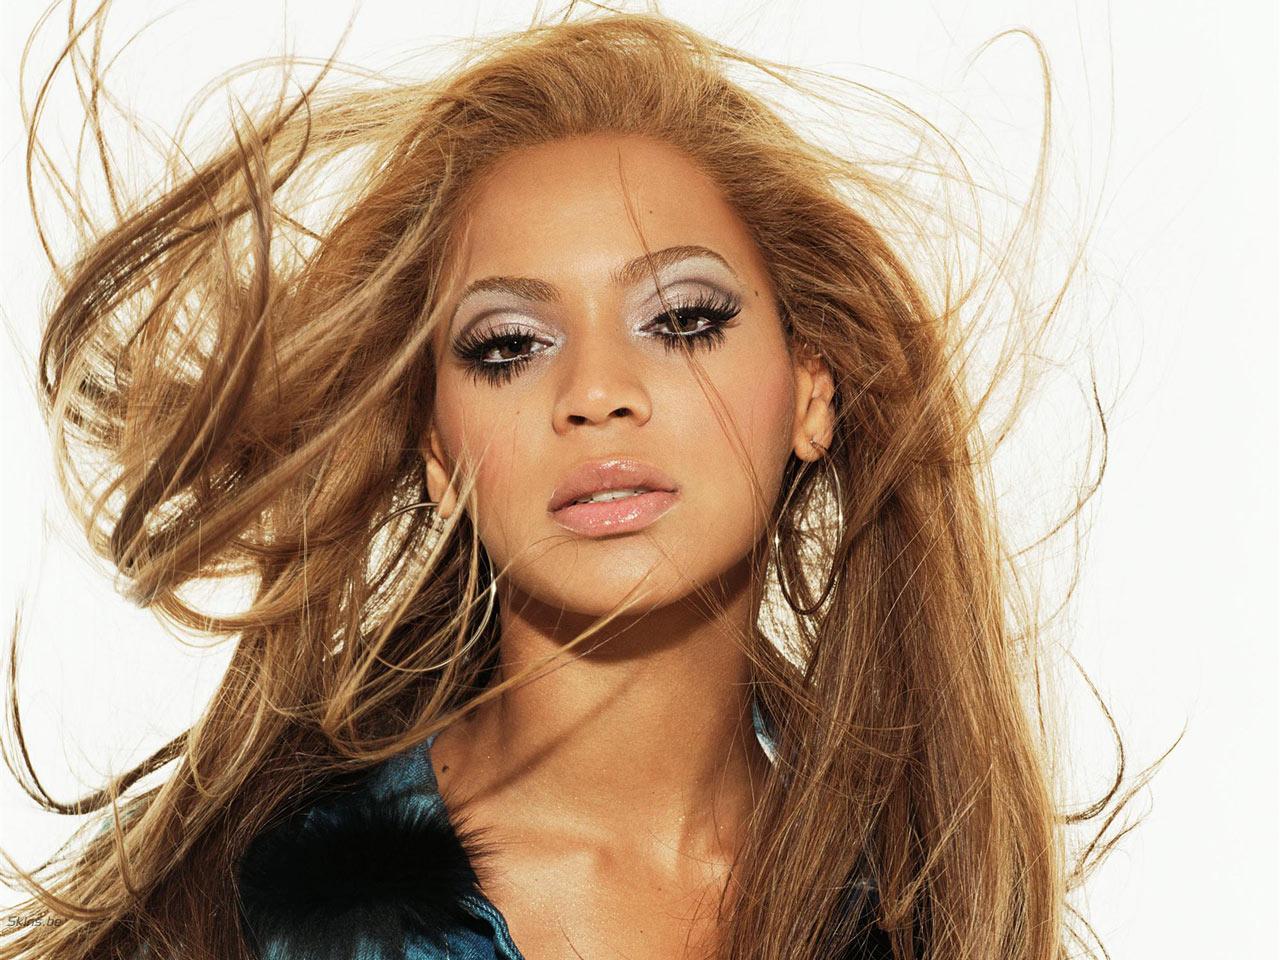 http://1.bp.blogspot.com/-RVVkBukQHRQ/UPHmu8ZsDLI/AAAAAAAAAns/4raIYurZntw/s1600/Beyonce+Knowles-1.jpg